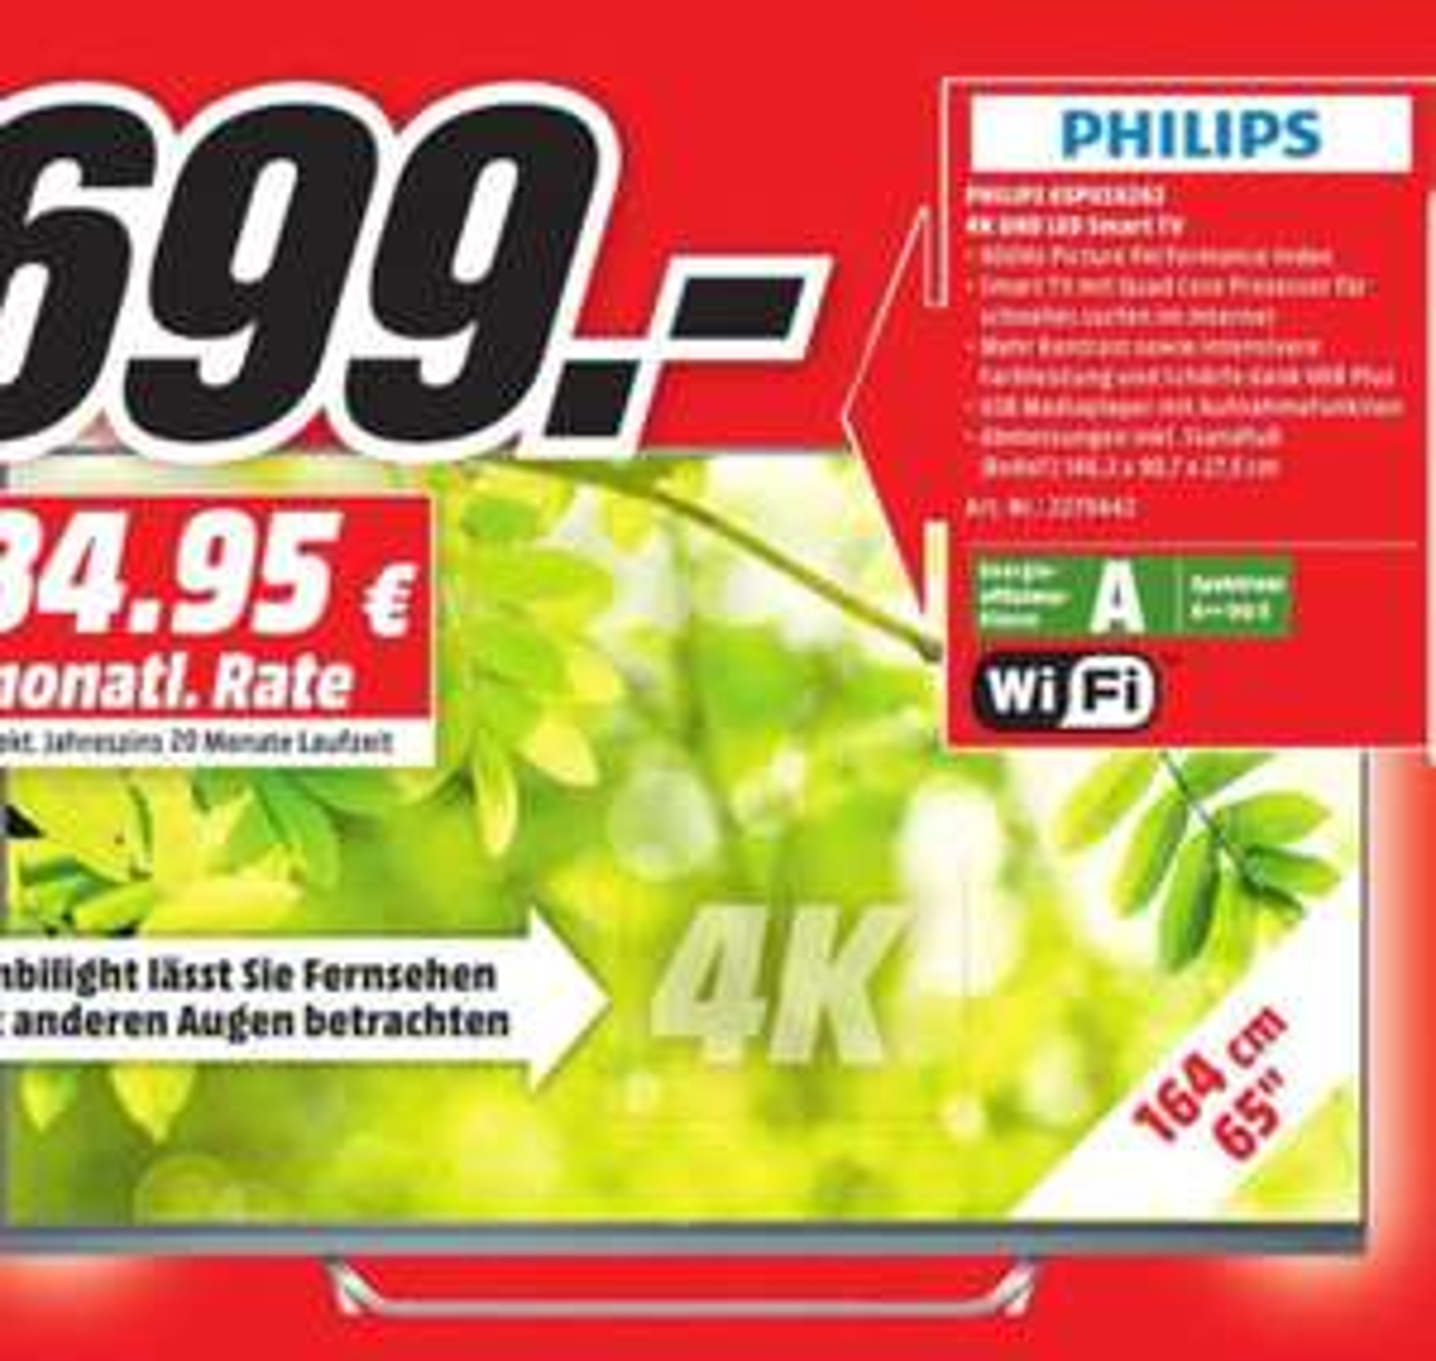 [Lokal Media Markt Bonn und Bornheim] Philips 65PUS6262 4K LED Smart TV